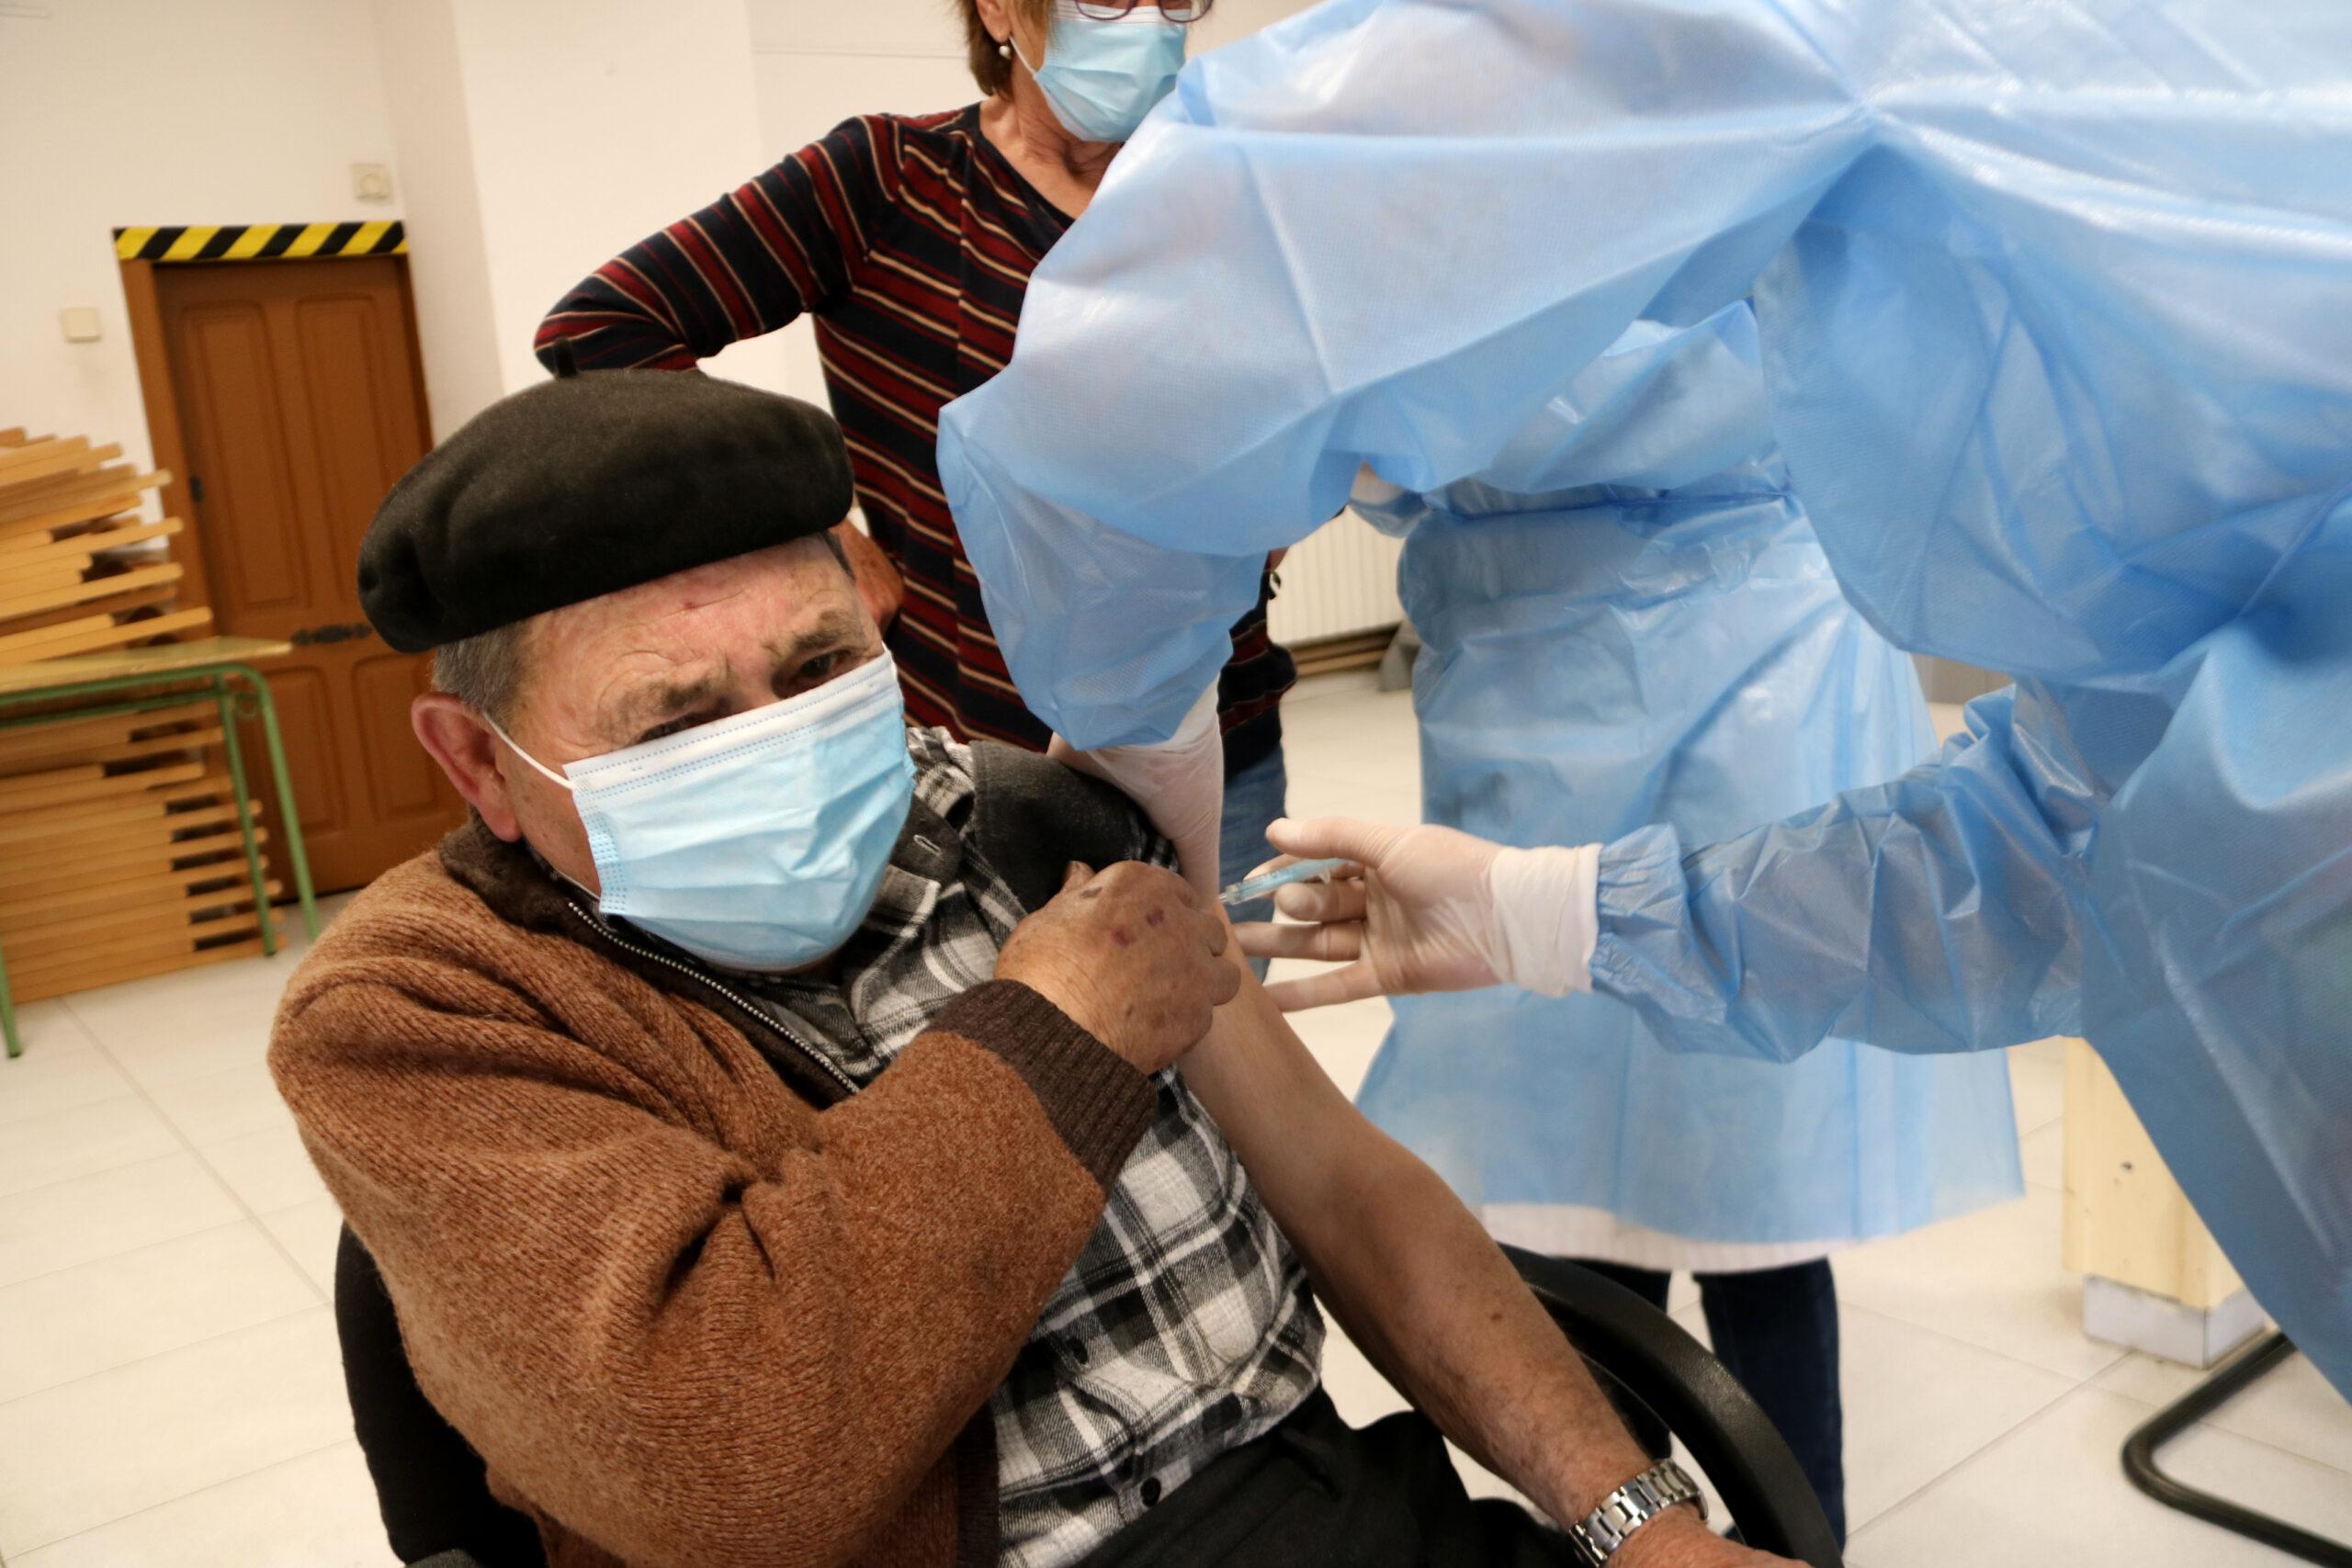 Un veí de la Vall Ferrera rebent la vacuna contra la covid-19 a Alins | ACN